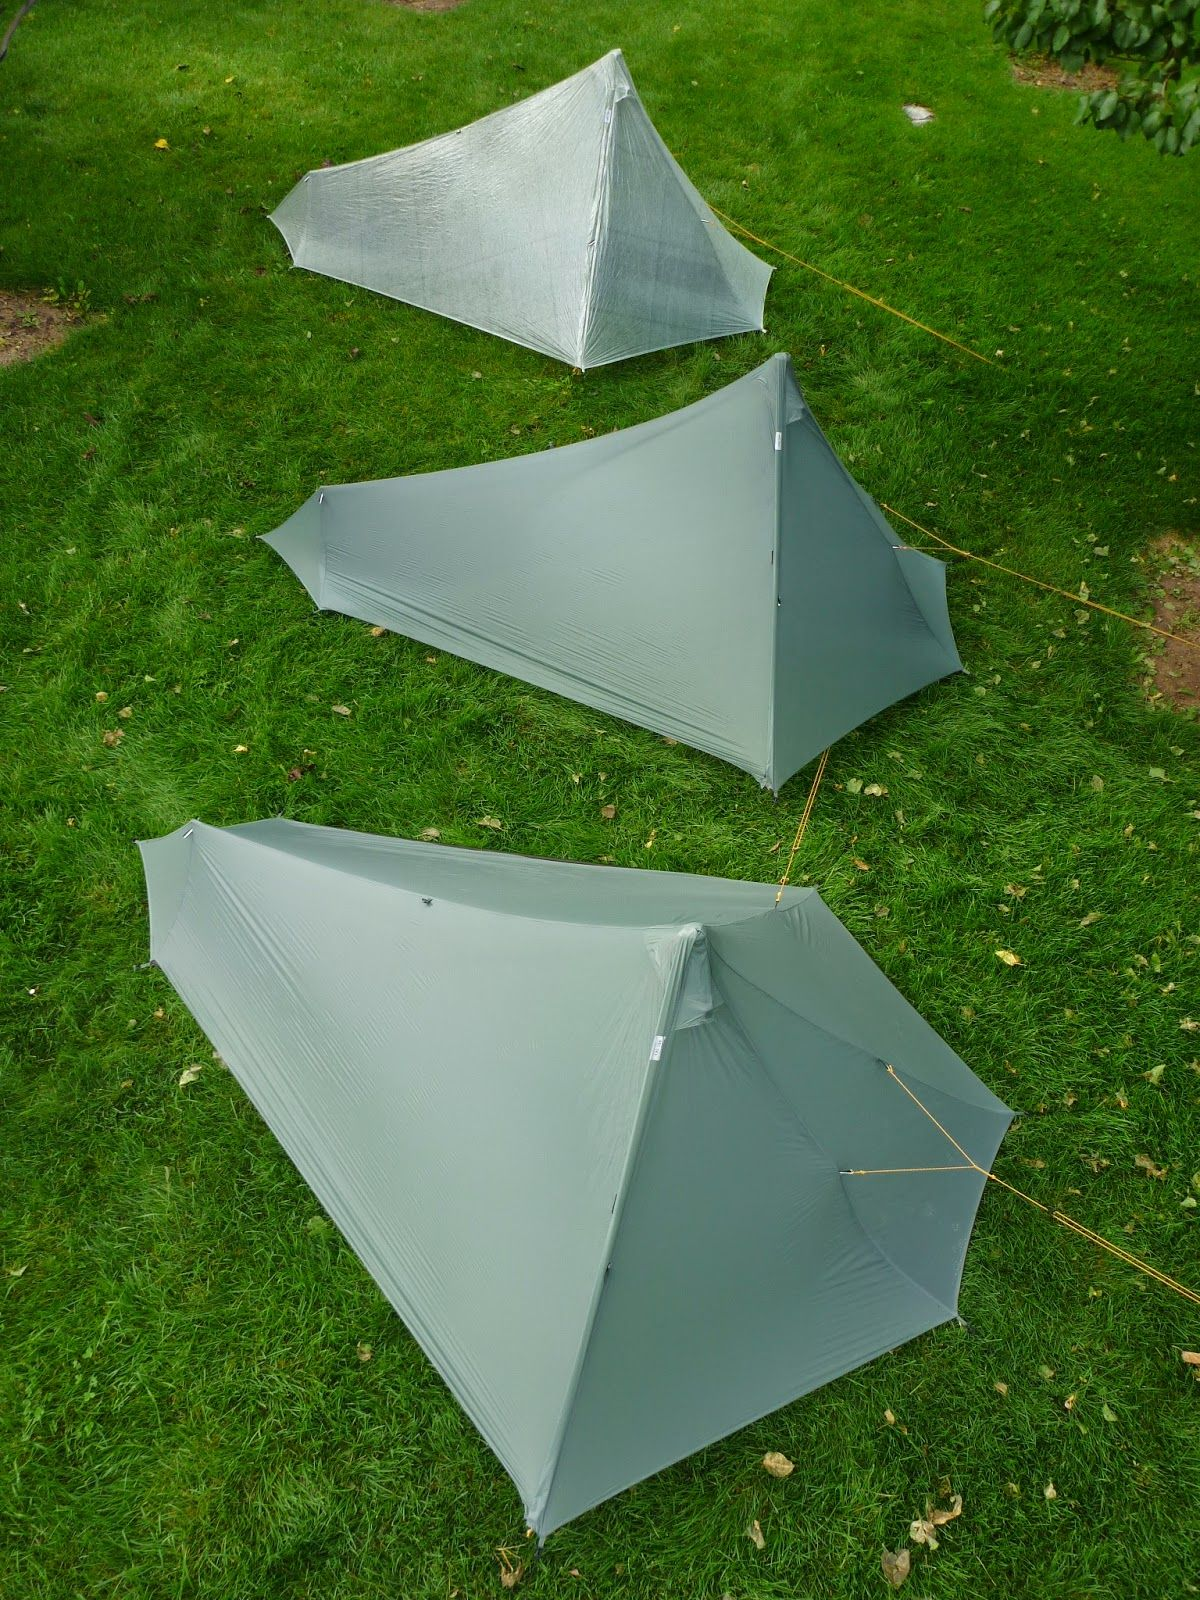 Ultralight Insights First Look Big Sky International Wisp 1P Tent (1- person & Ultralight Insights: First Look: Big Sky International Wisp 1P ...